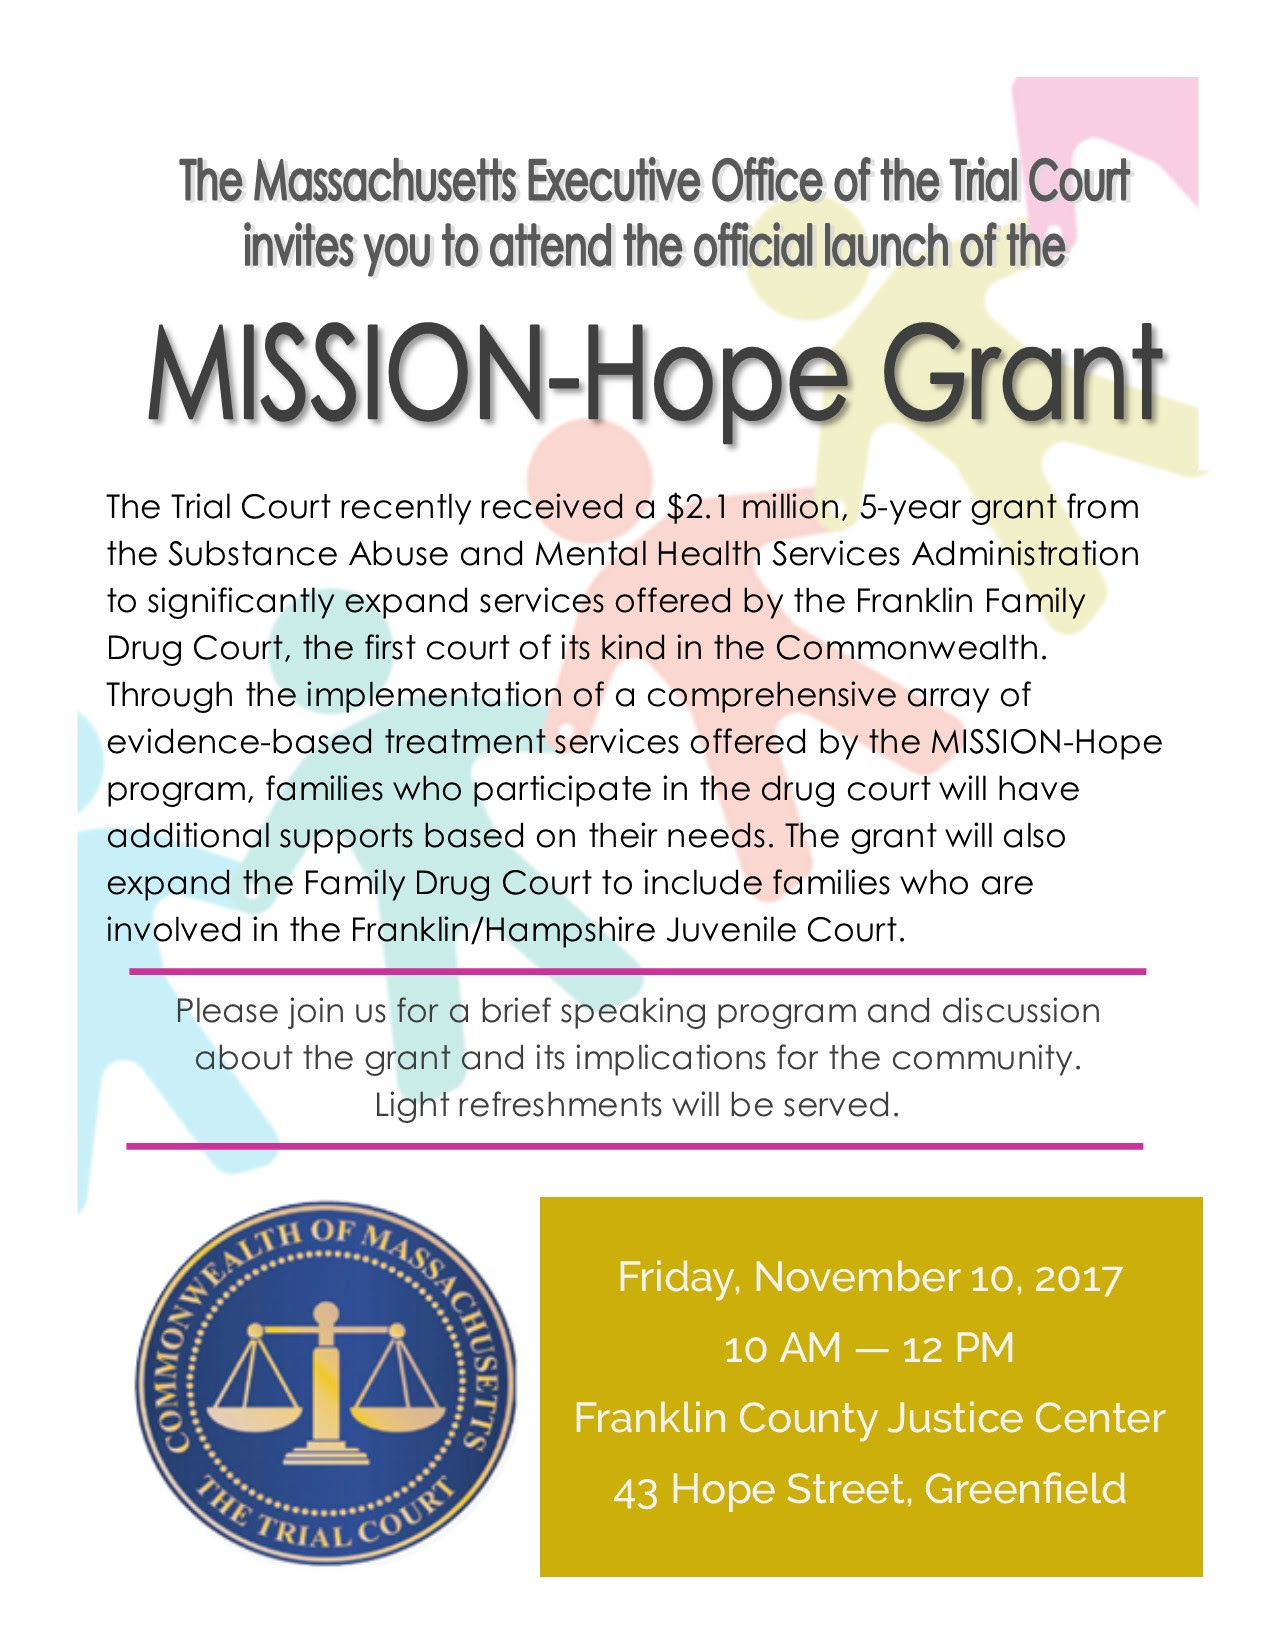 MISSION-Hope Grant Kickoff